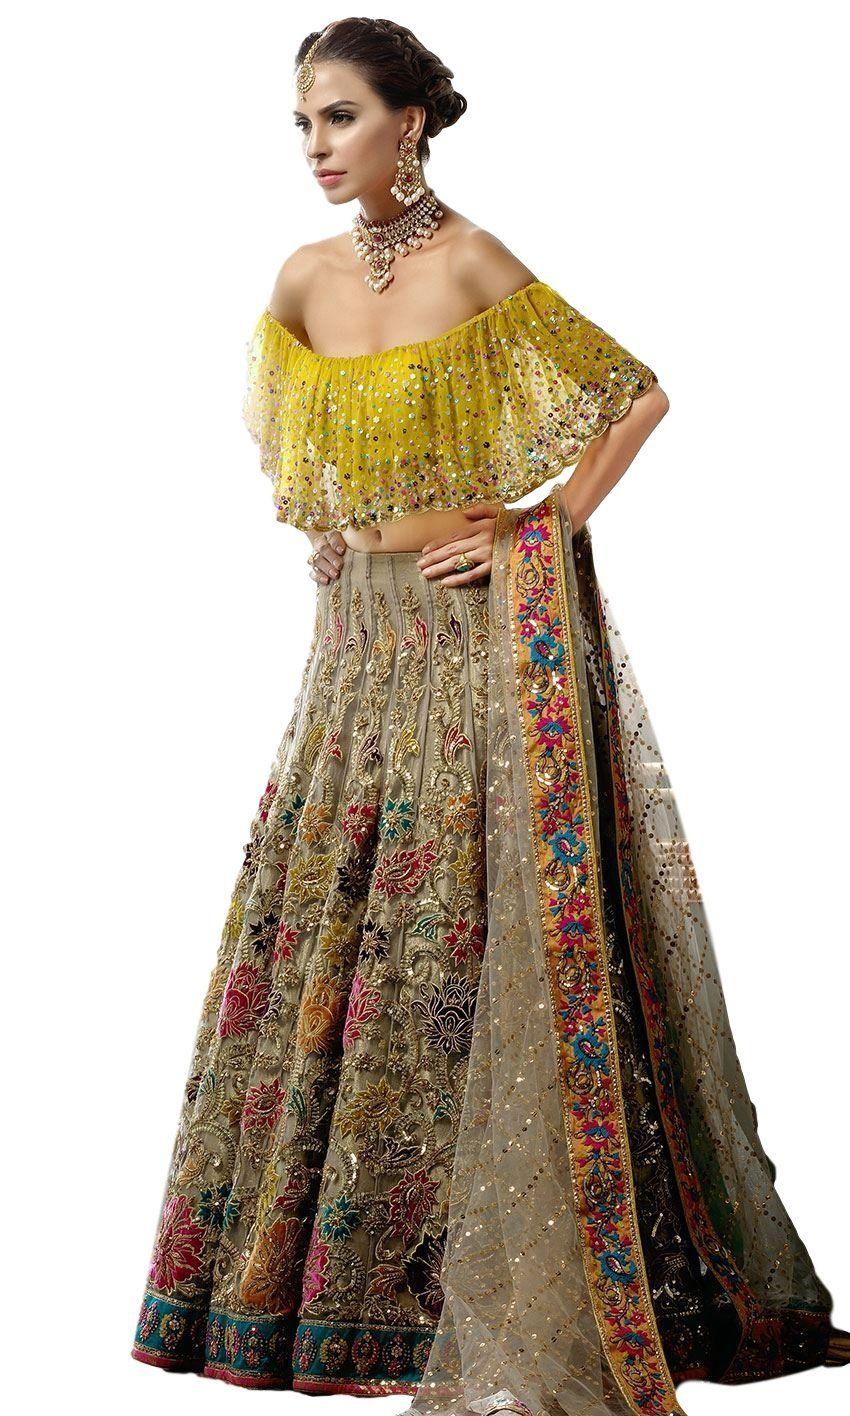 Fawn Color Wedding Lehenga With Multicolor Embroidery Lehenga